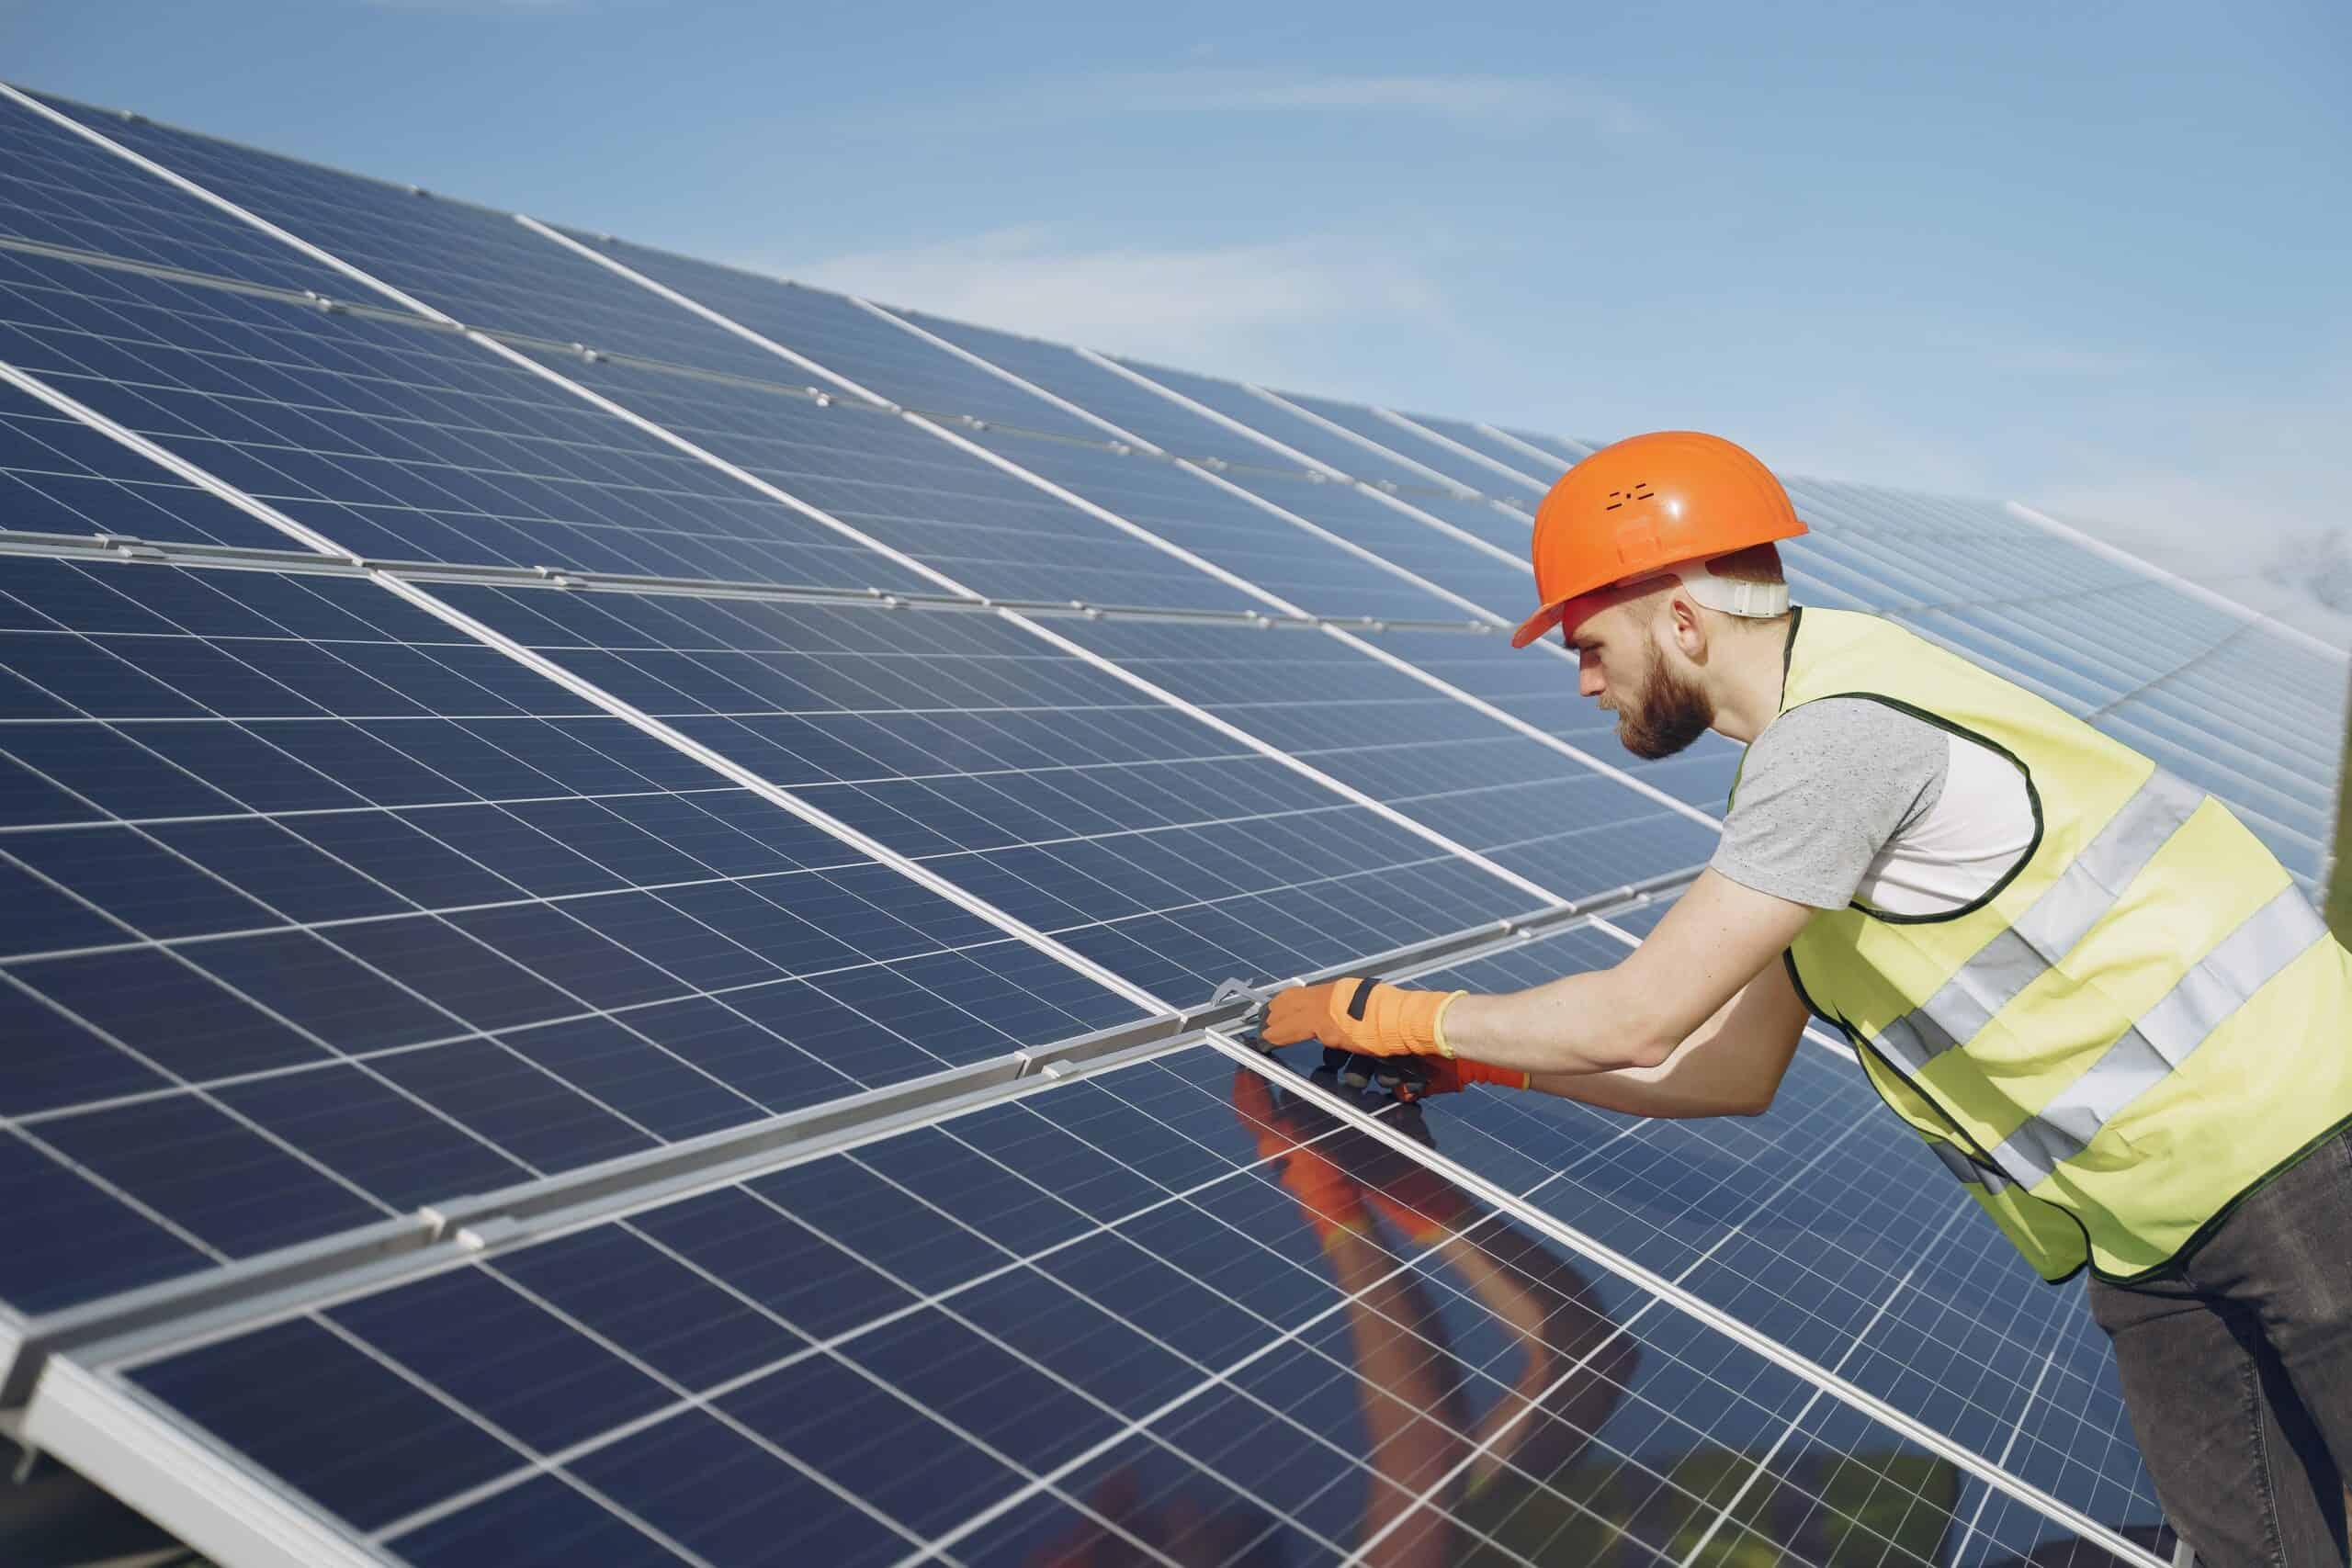 Solar panel installer inspecting solar panels